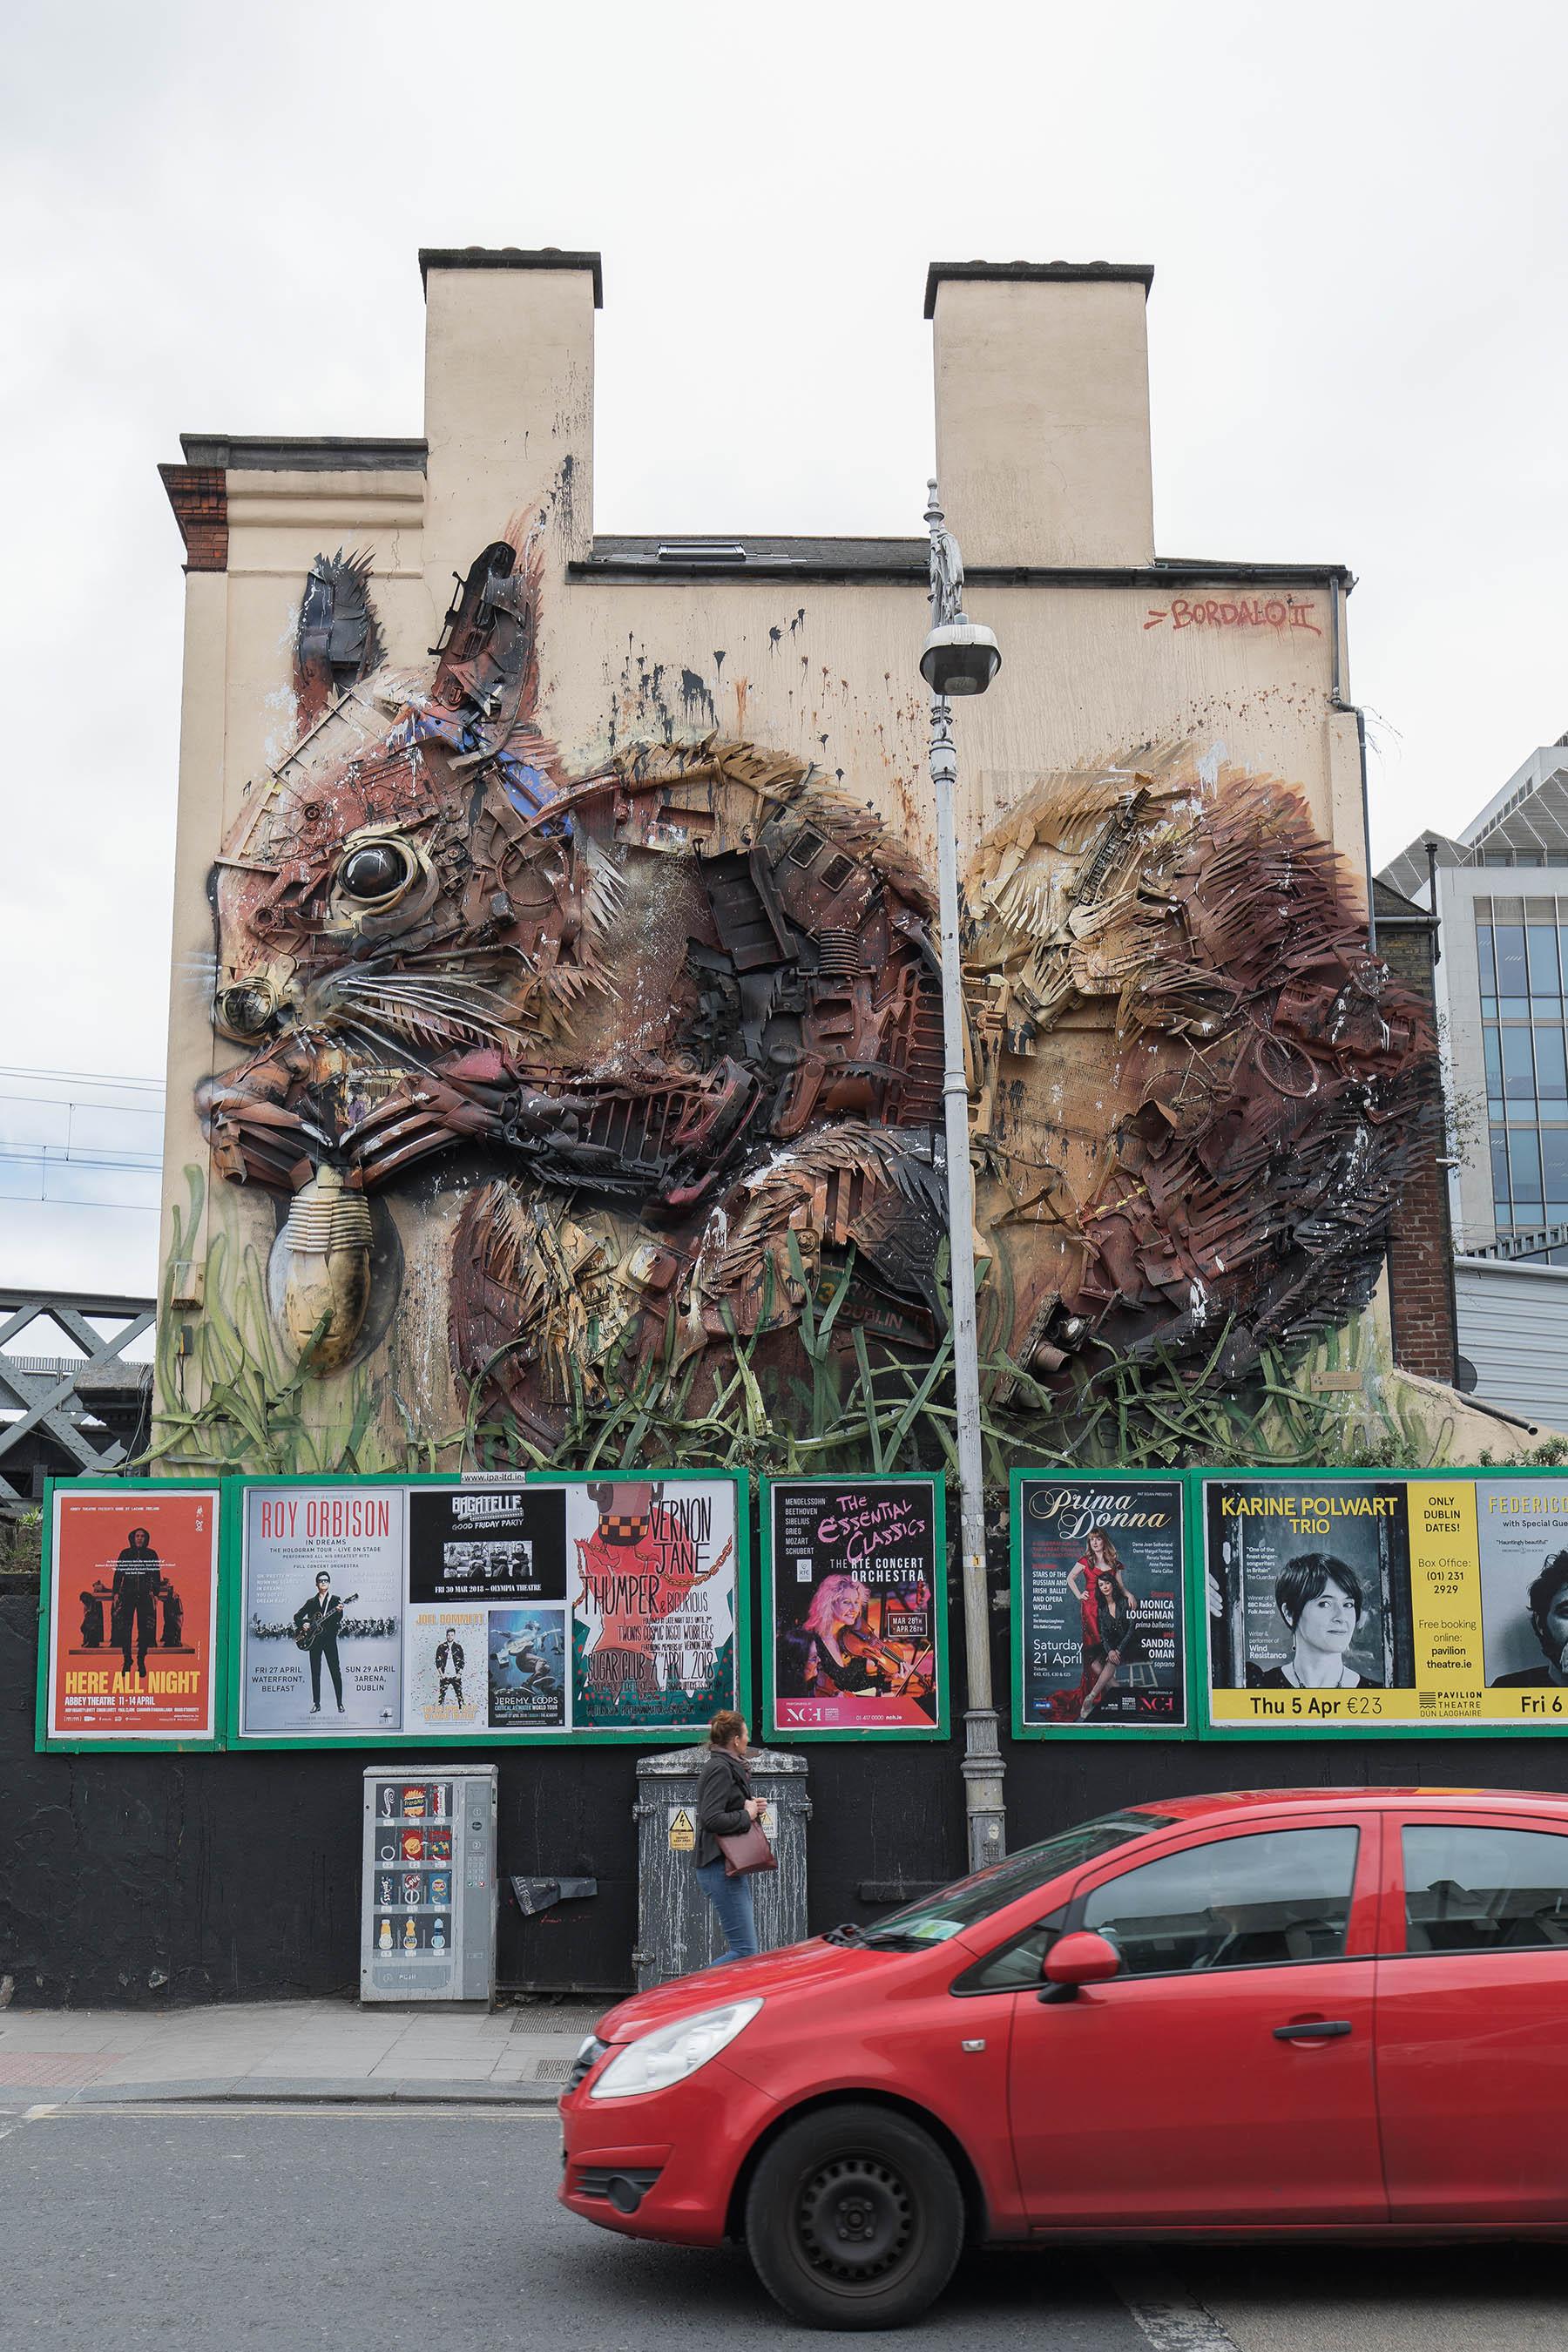 dublin-ireland-europe-art-street-famous-place-city-pub-themovinglens-colourfull-travel-photography-destination-life